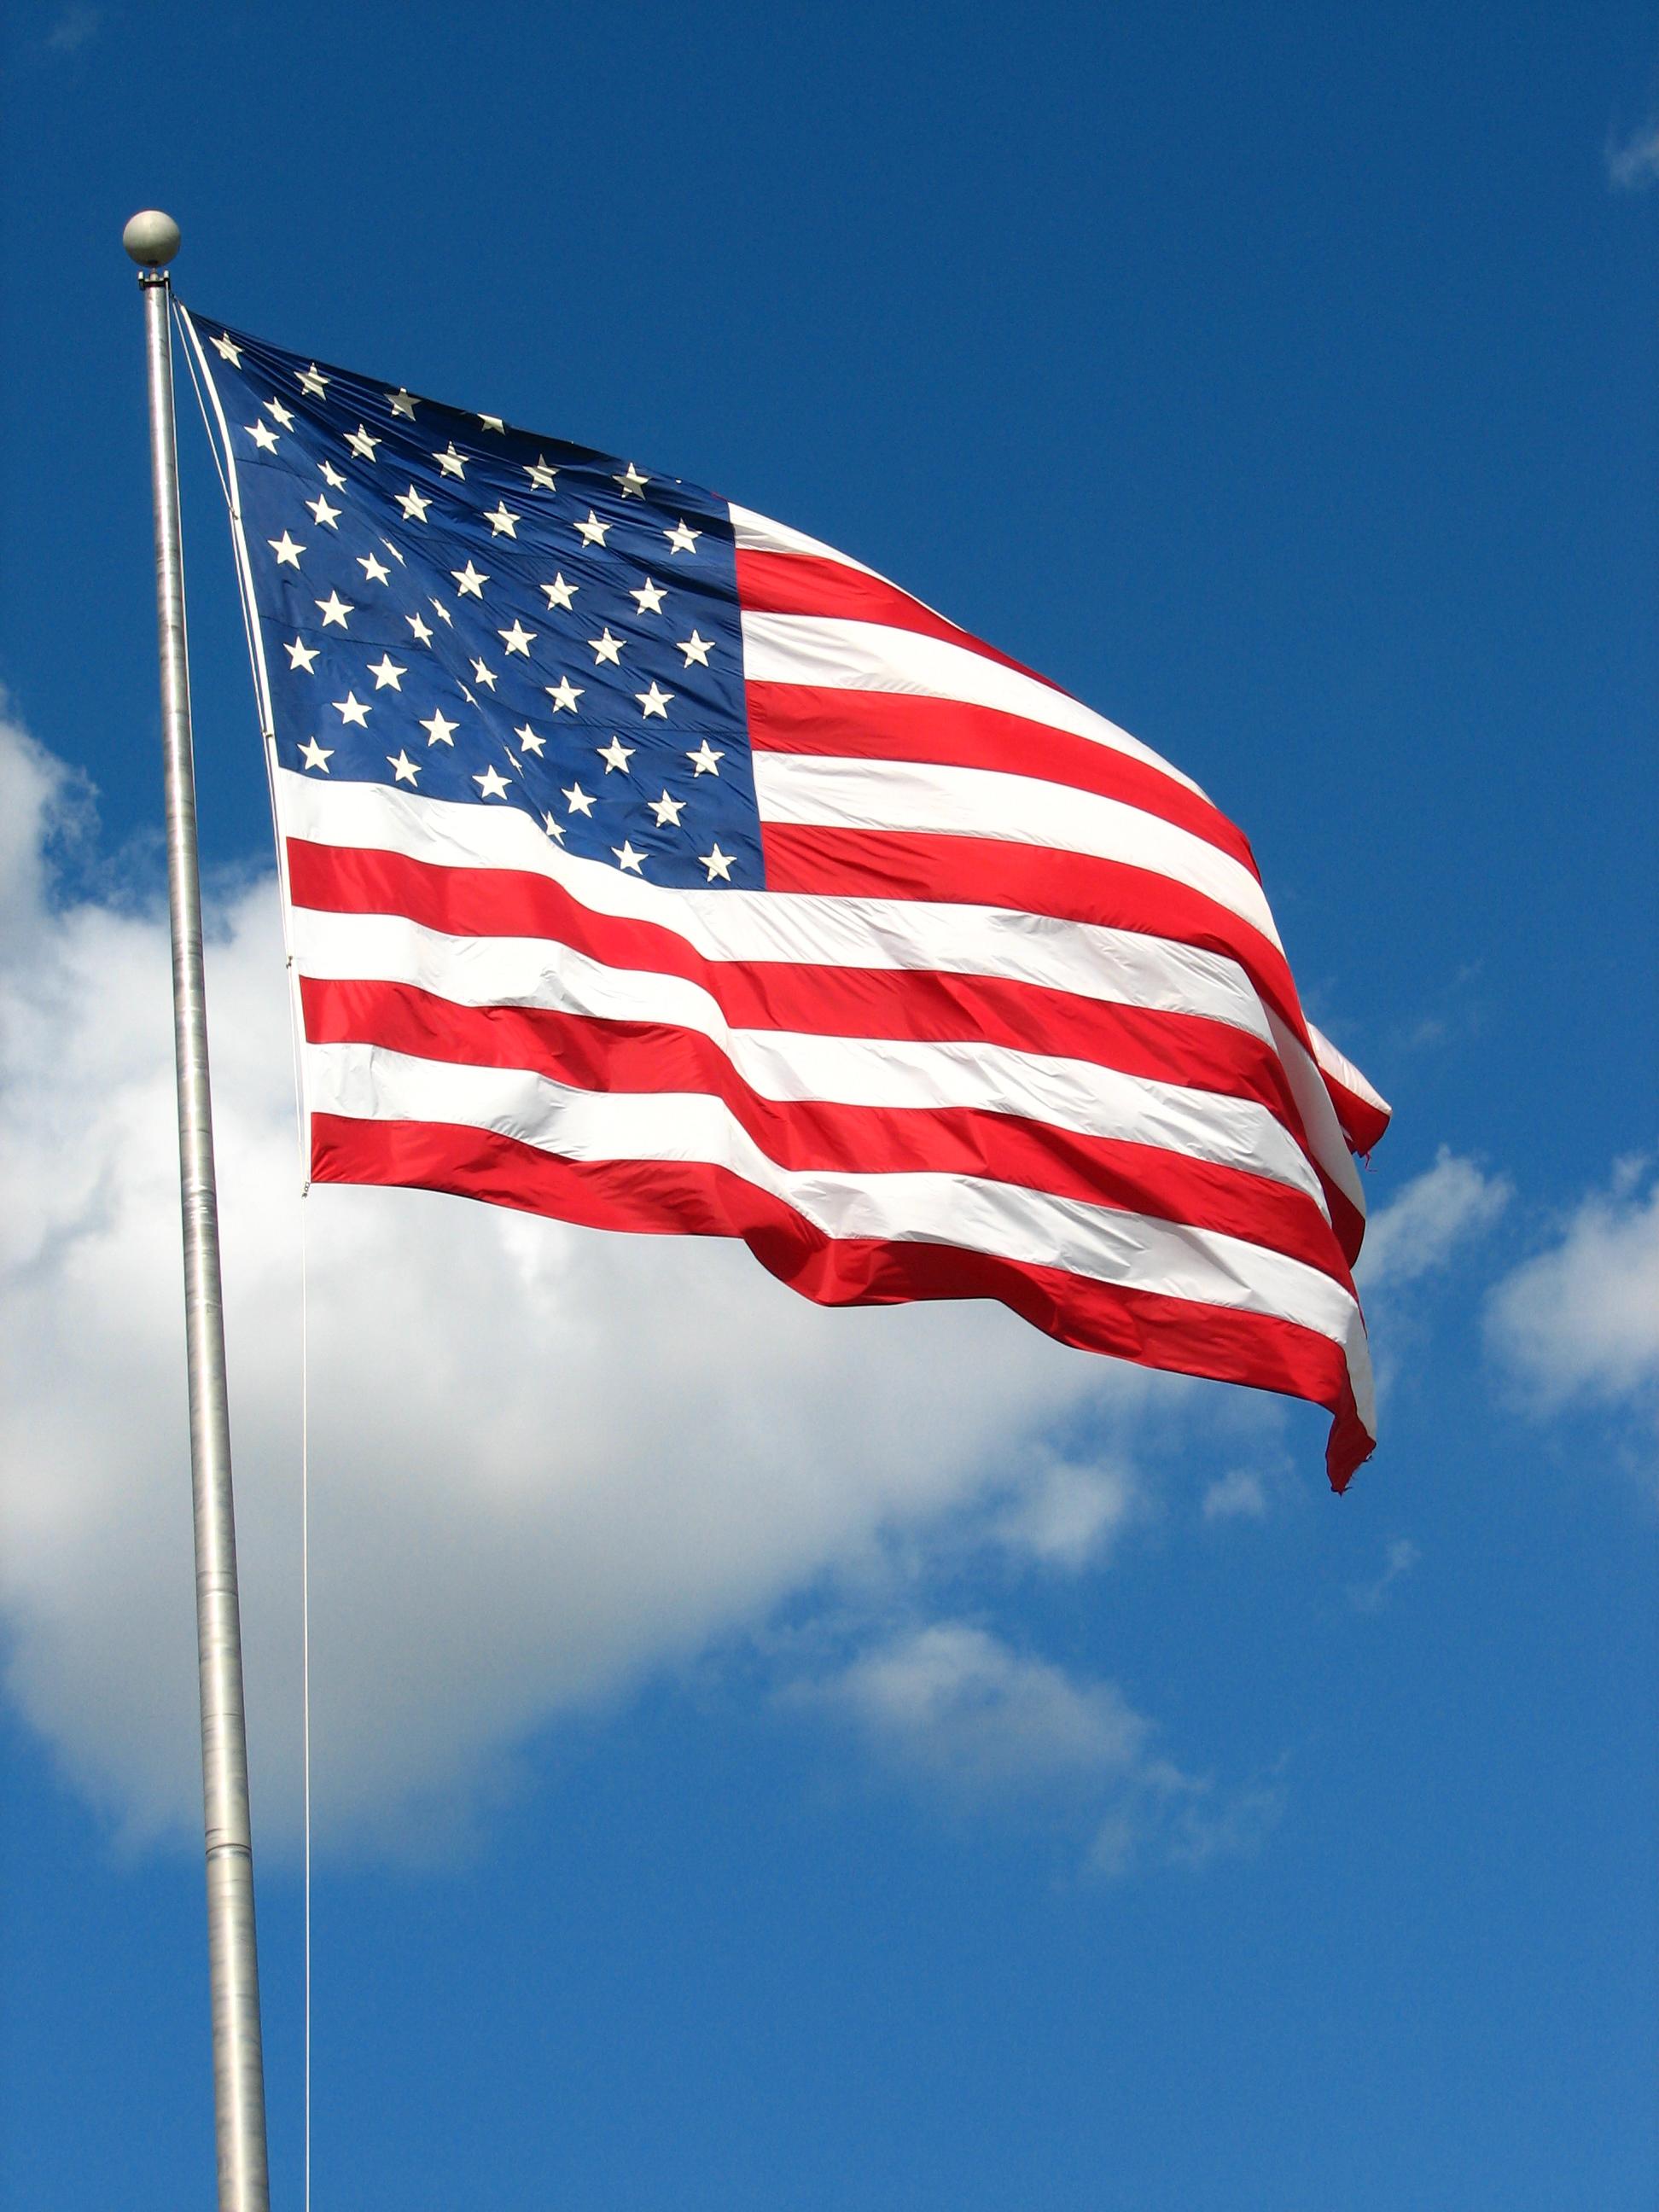 americanflag - DeviantArt